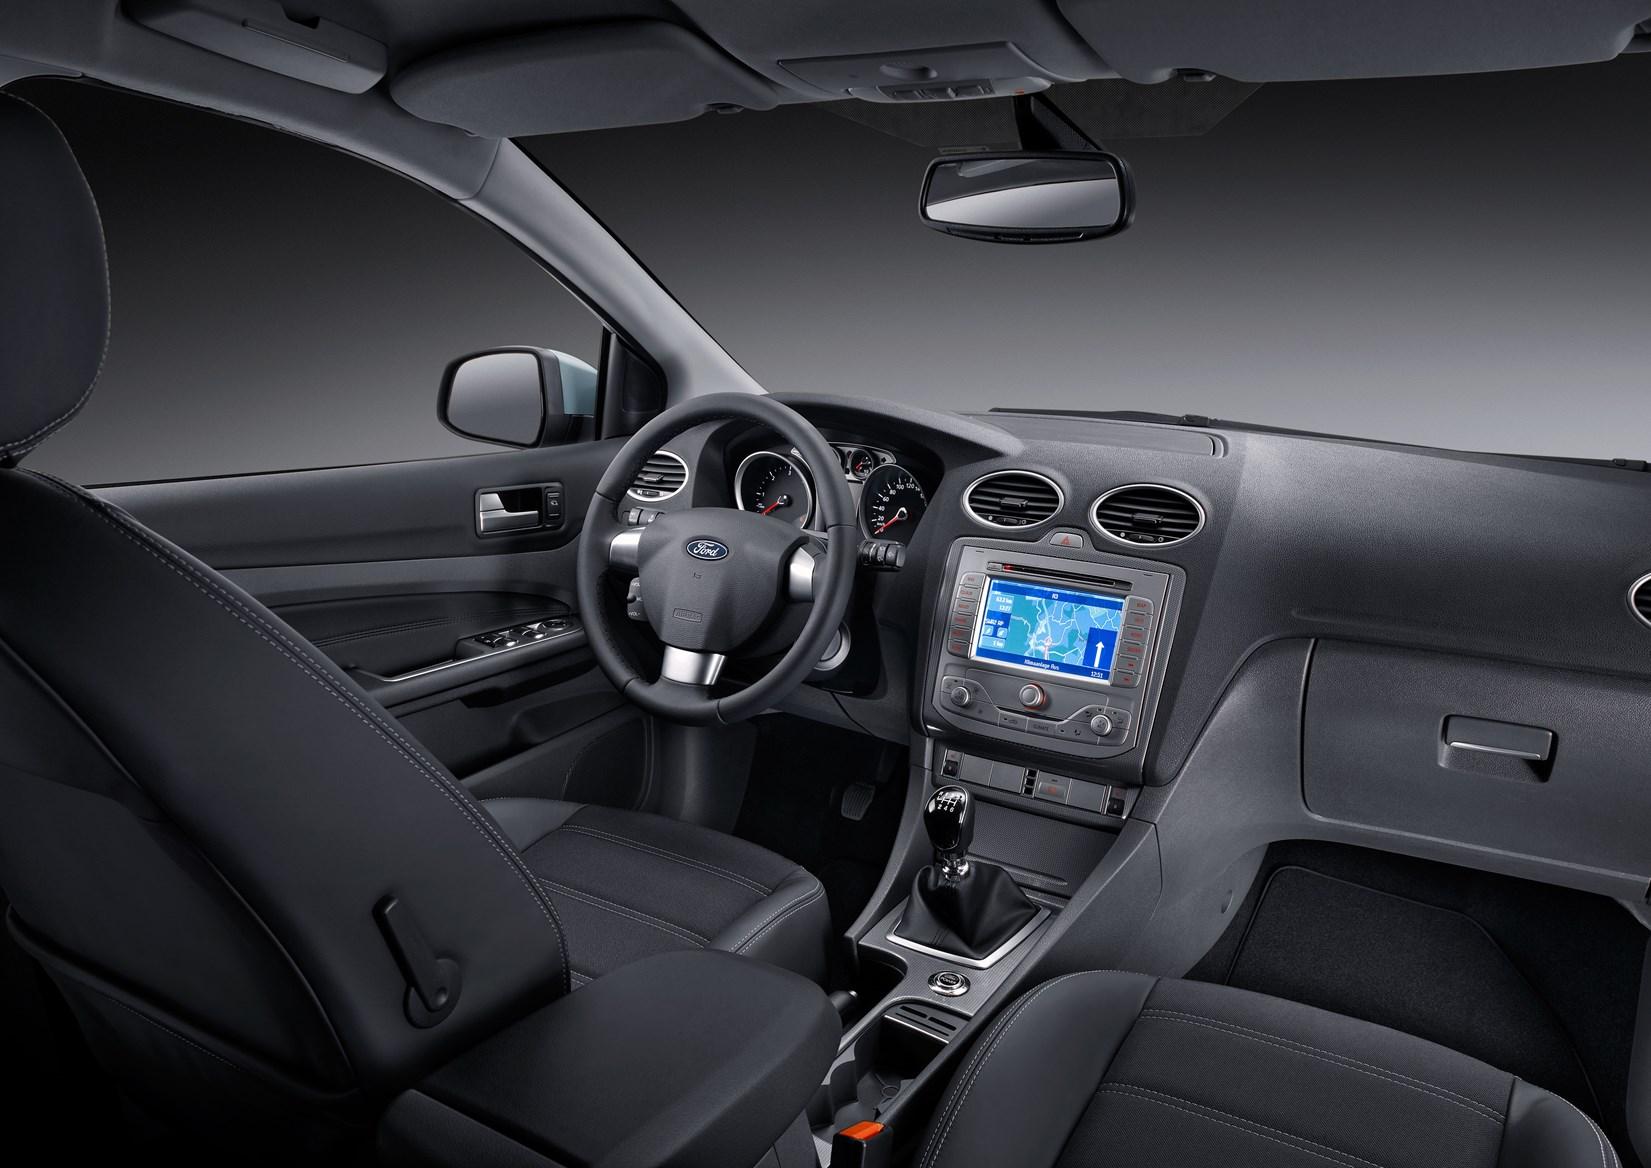 2008 Ford Focus Interior The Image Kid Has It